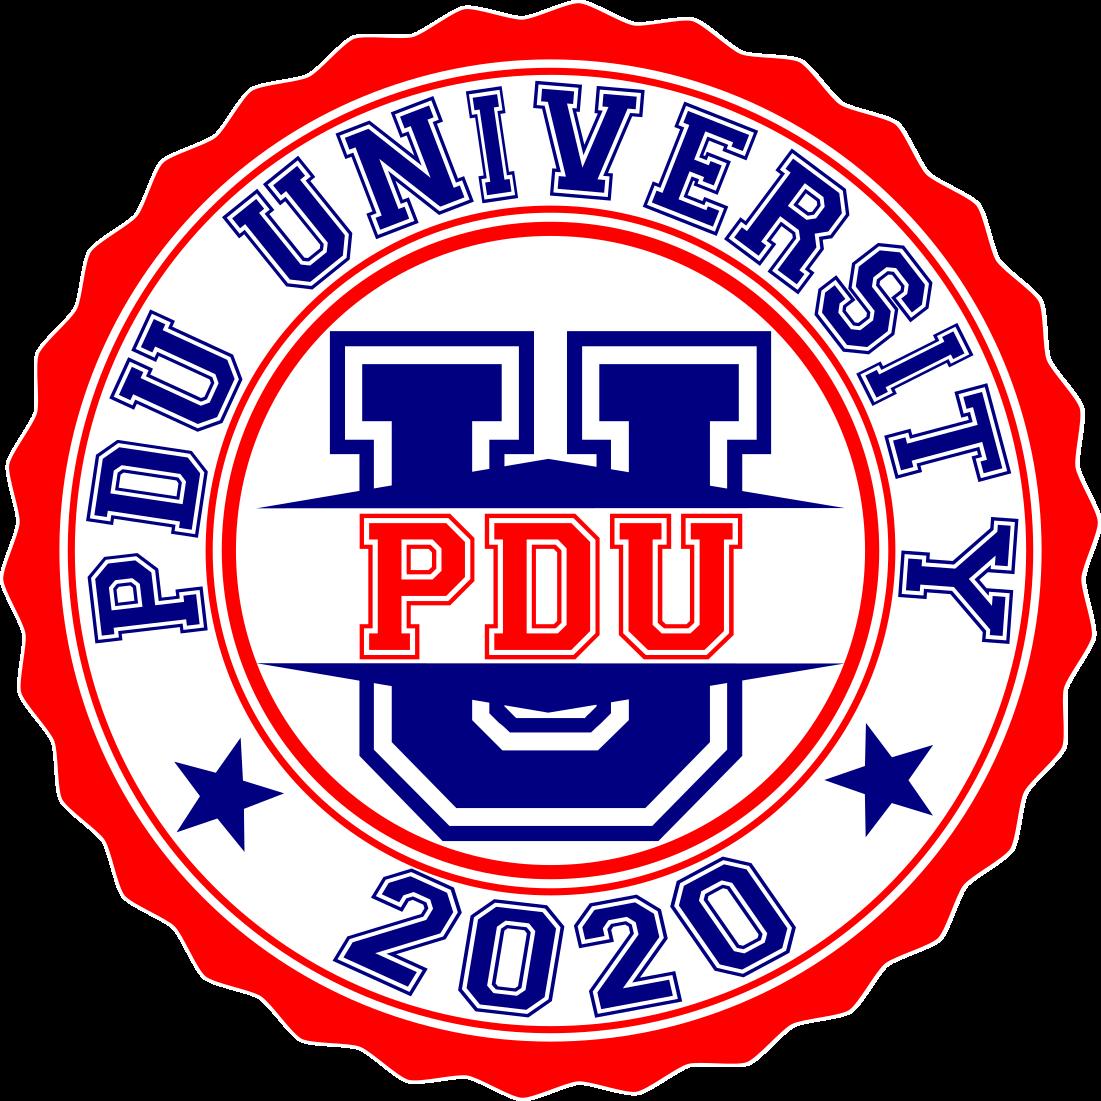 pdu university